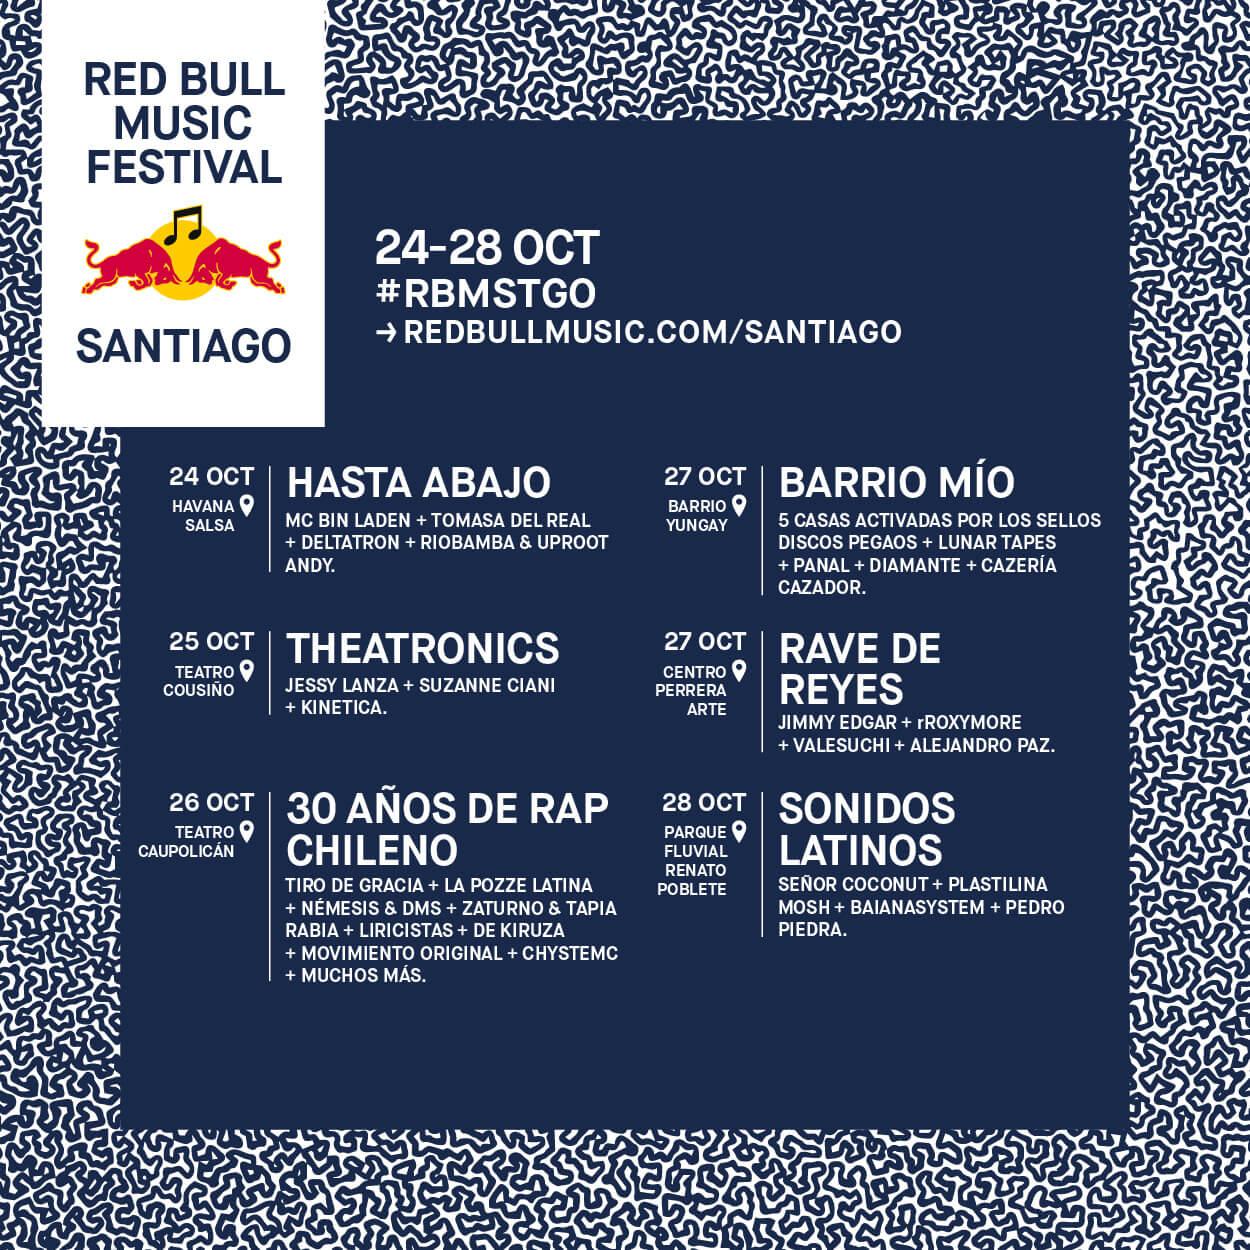 Poster oficial del lineup del Red Bull Music Festival Santiago 2018. Imagen: Red Bull